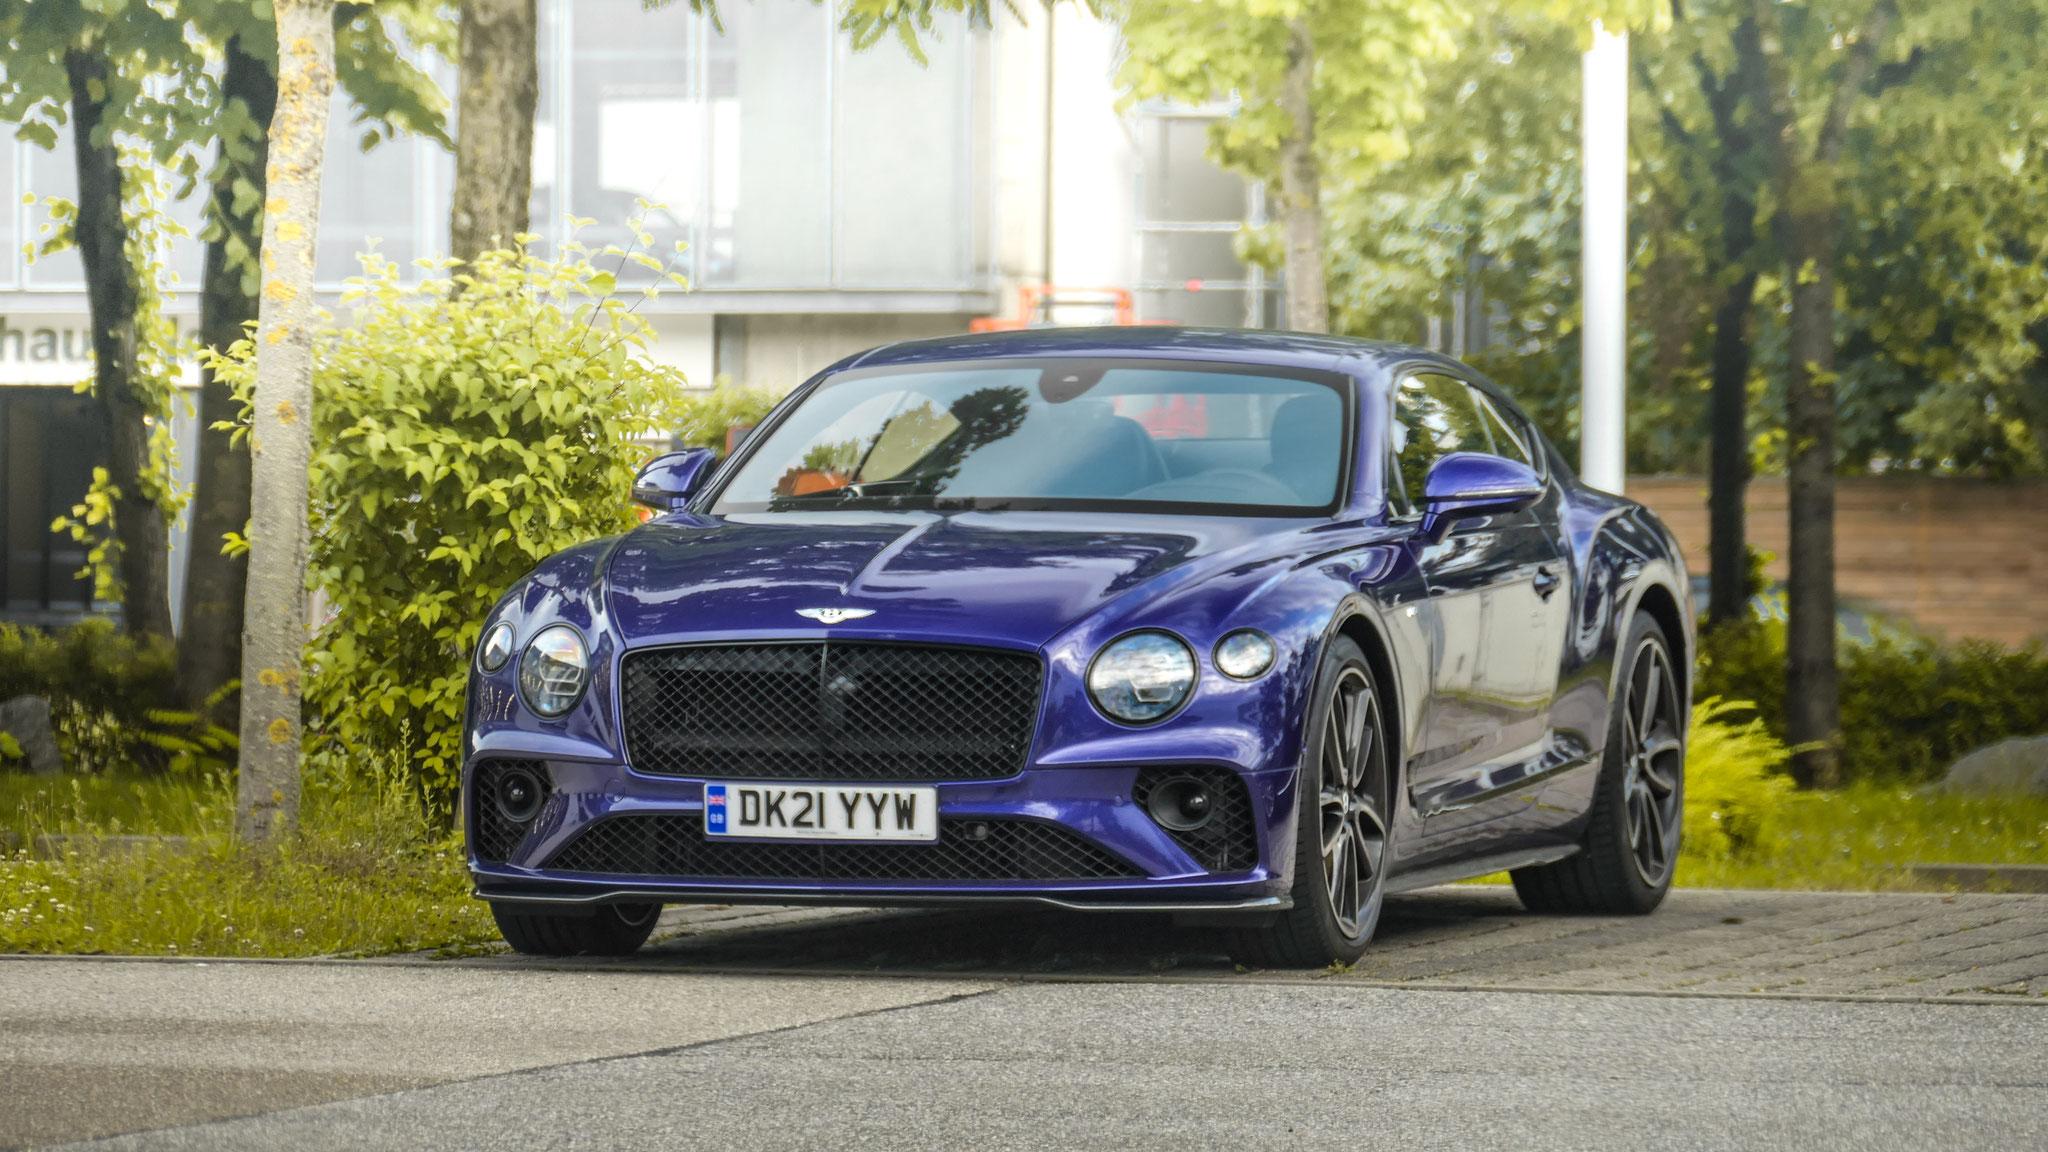 Bentley Continental GT - DK21-YYW (GB)